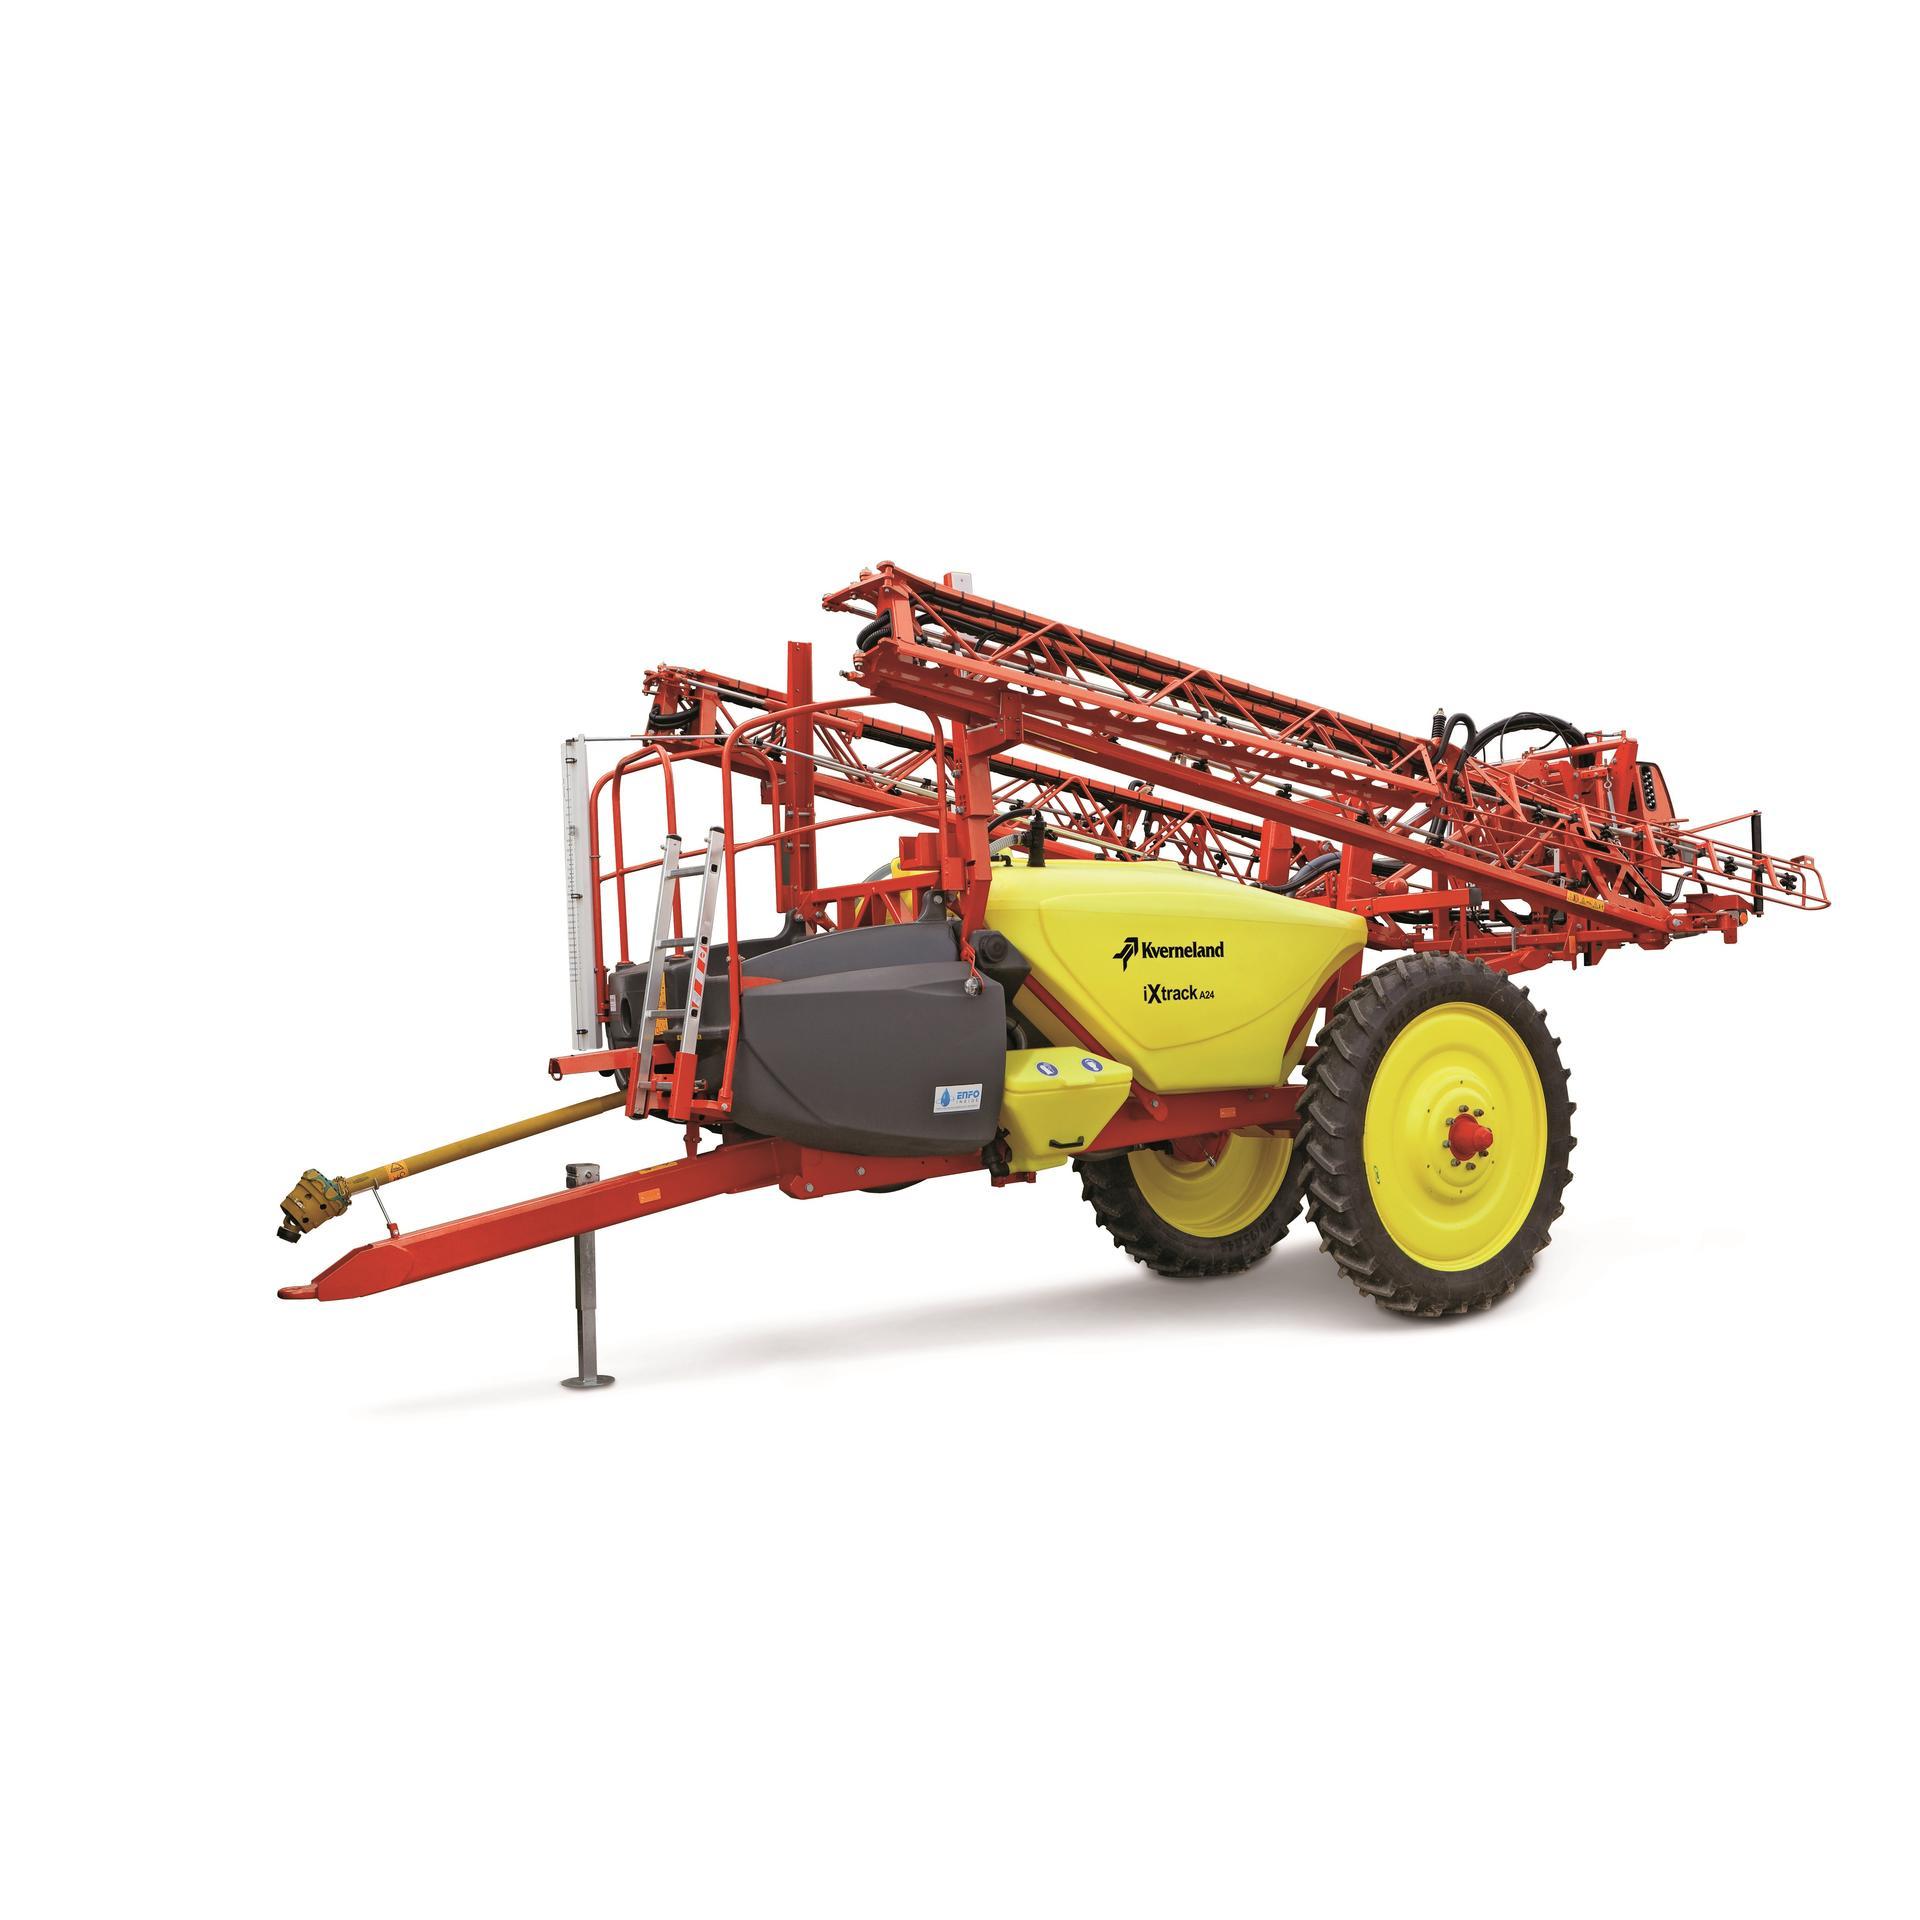 Vicon iXtrack C / Trailed Sprayers / Spraying Equipment / Vicon ...